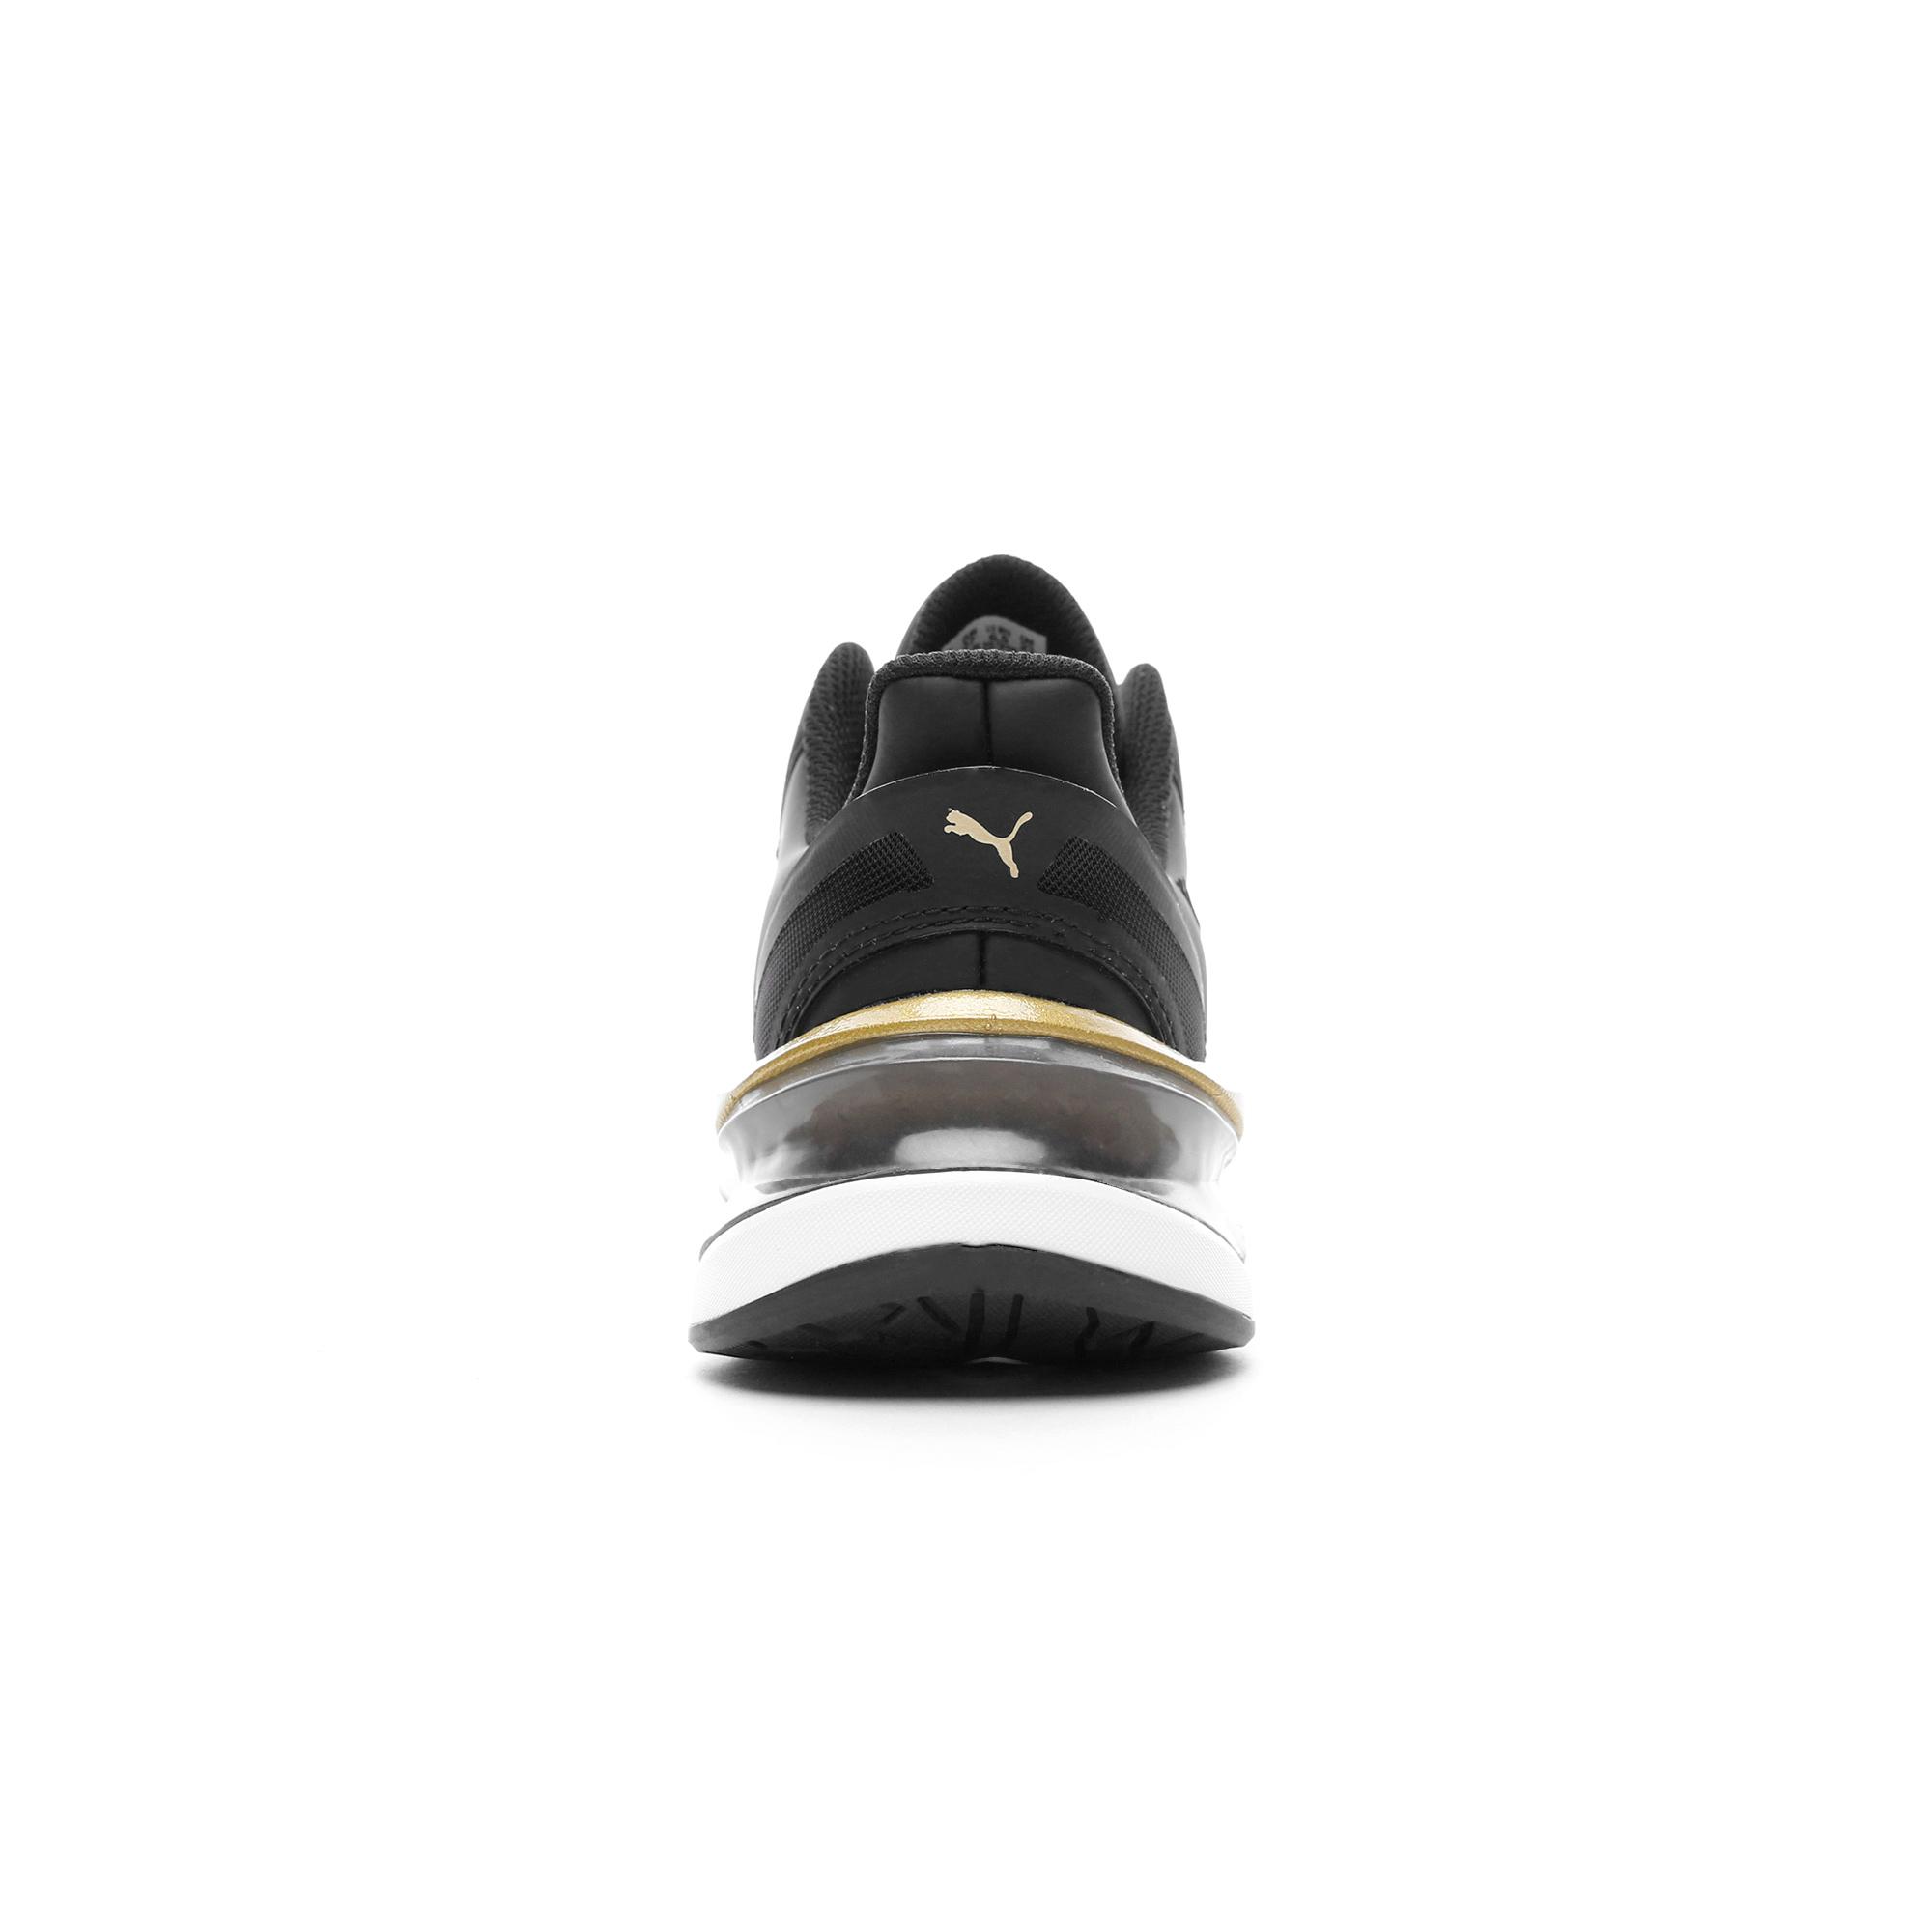 Puma LQDCell Shatter Xtmatte Kadın Siyah Spor Ayakkabı